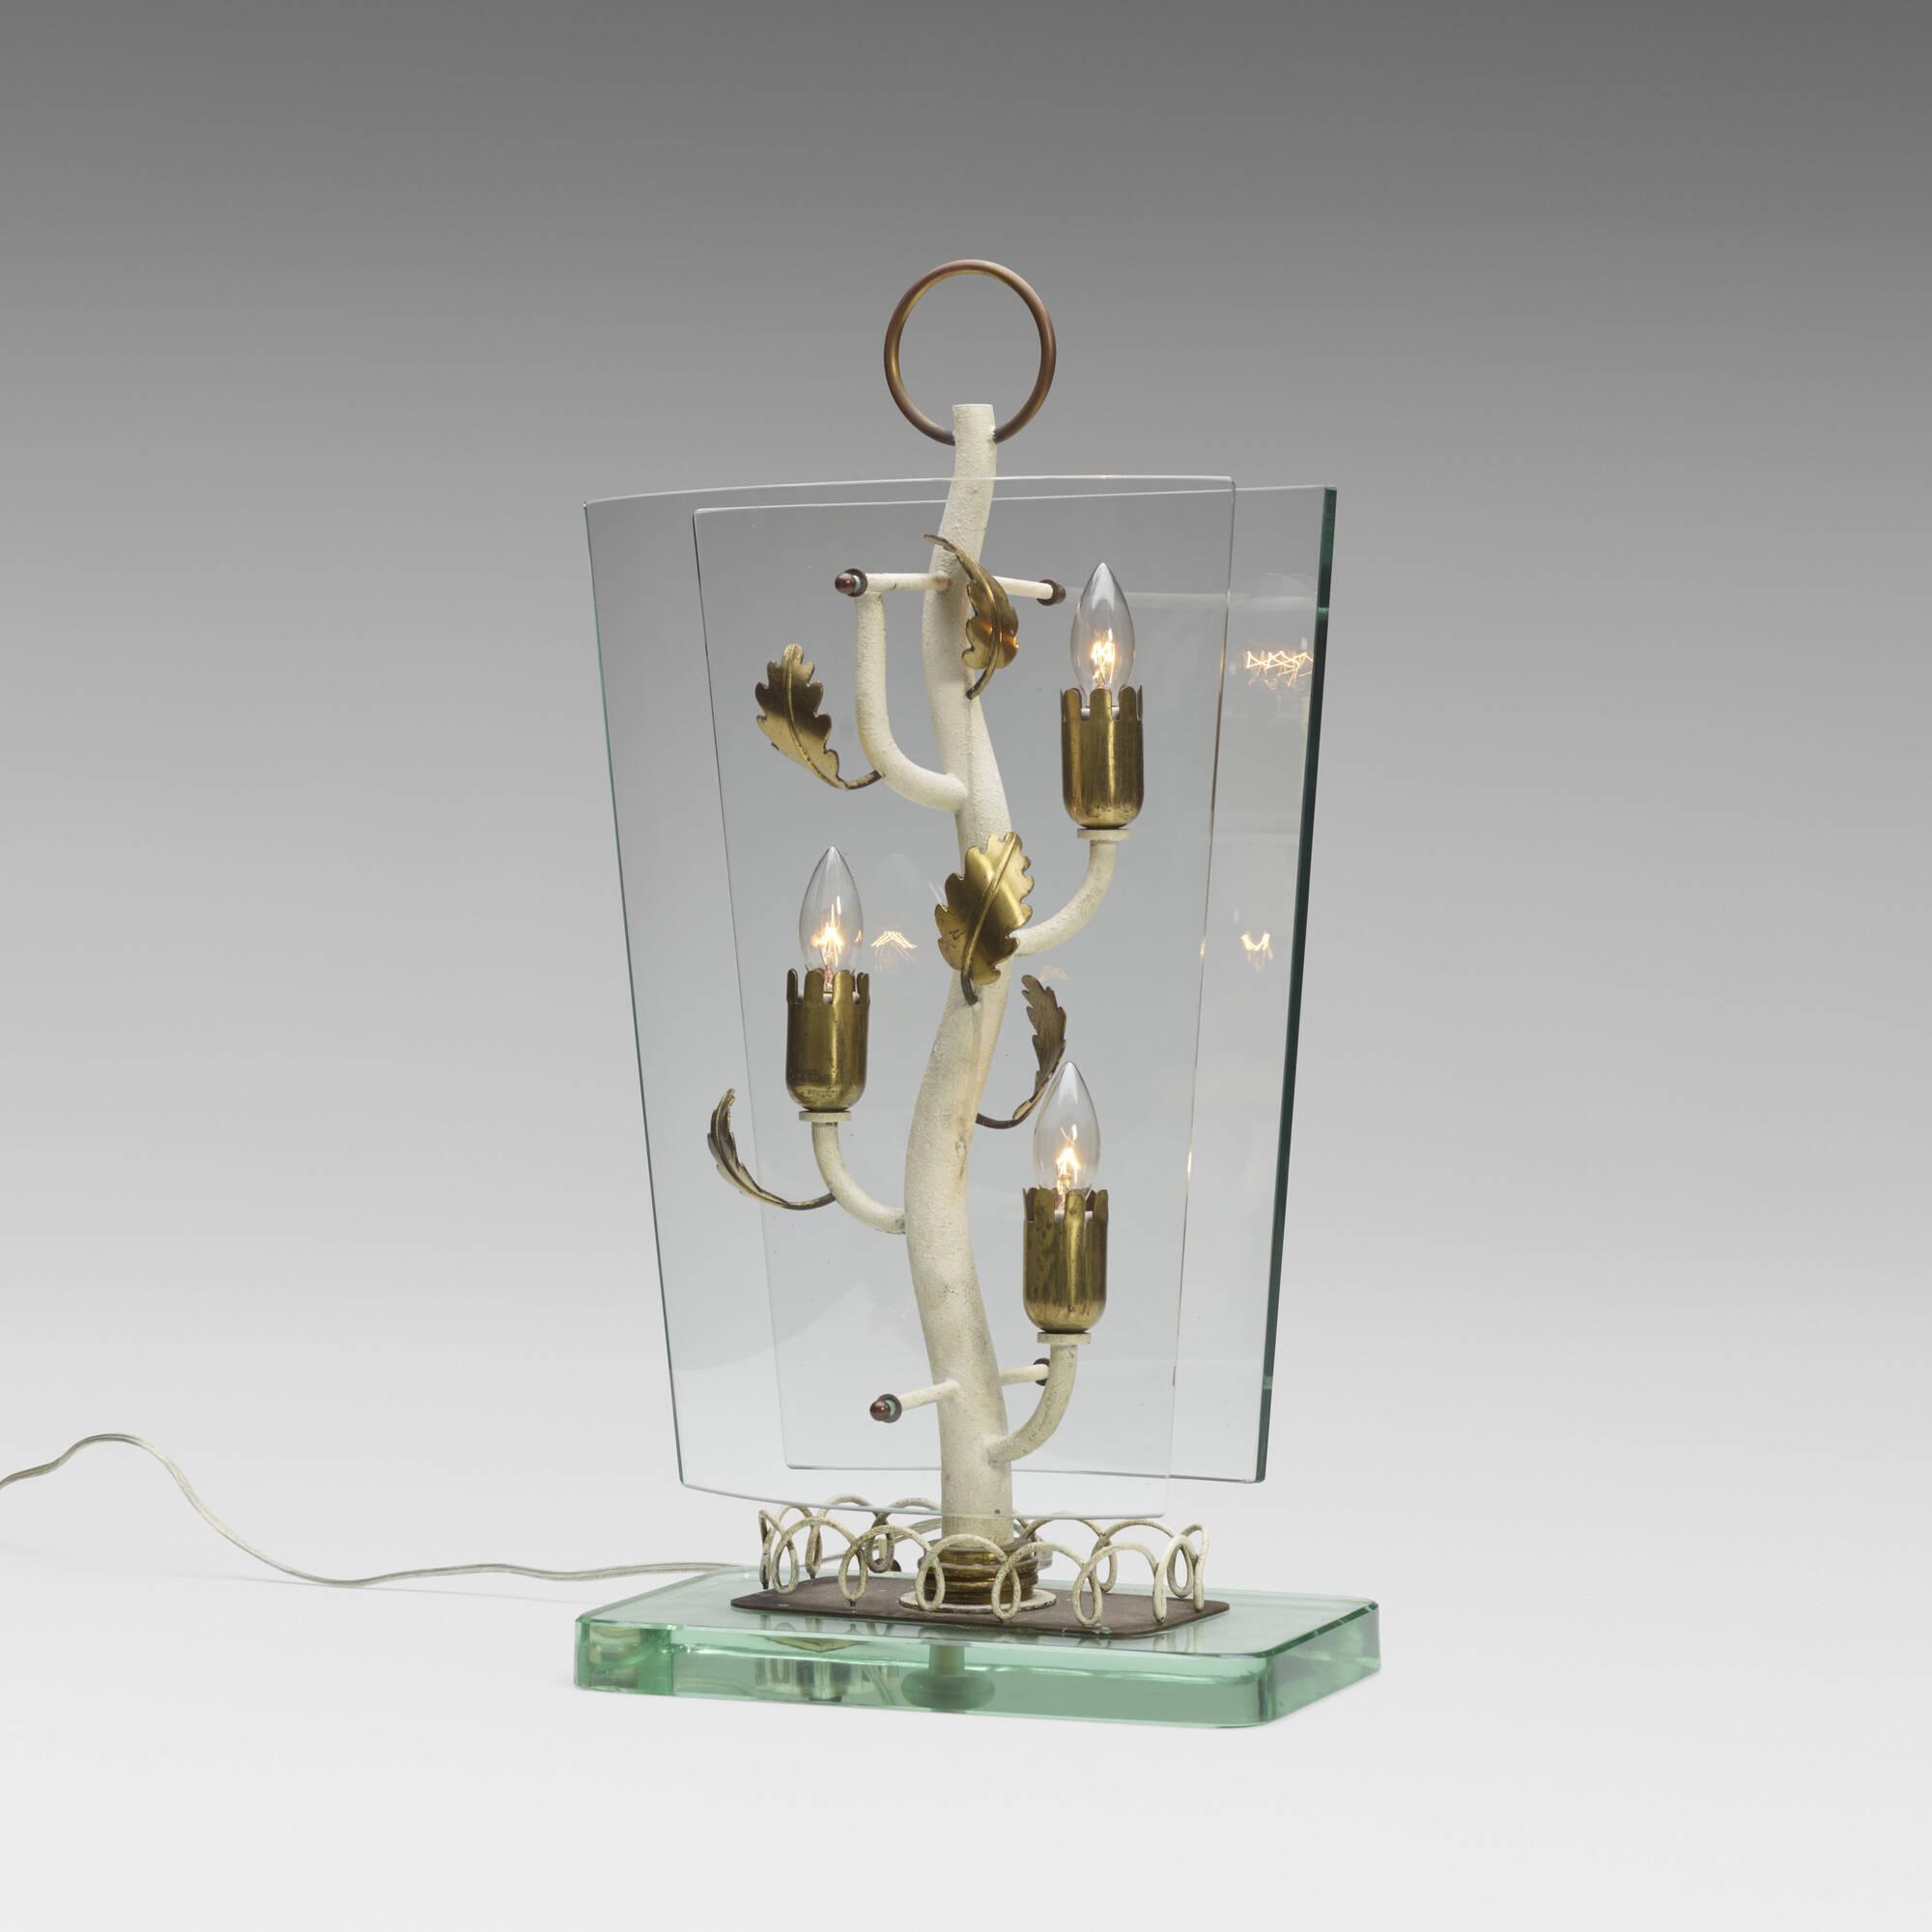 243: Pietro Chiesa / table lamp (1 of 2)